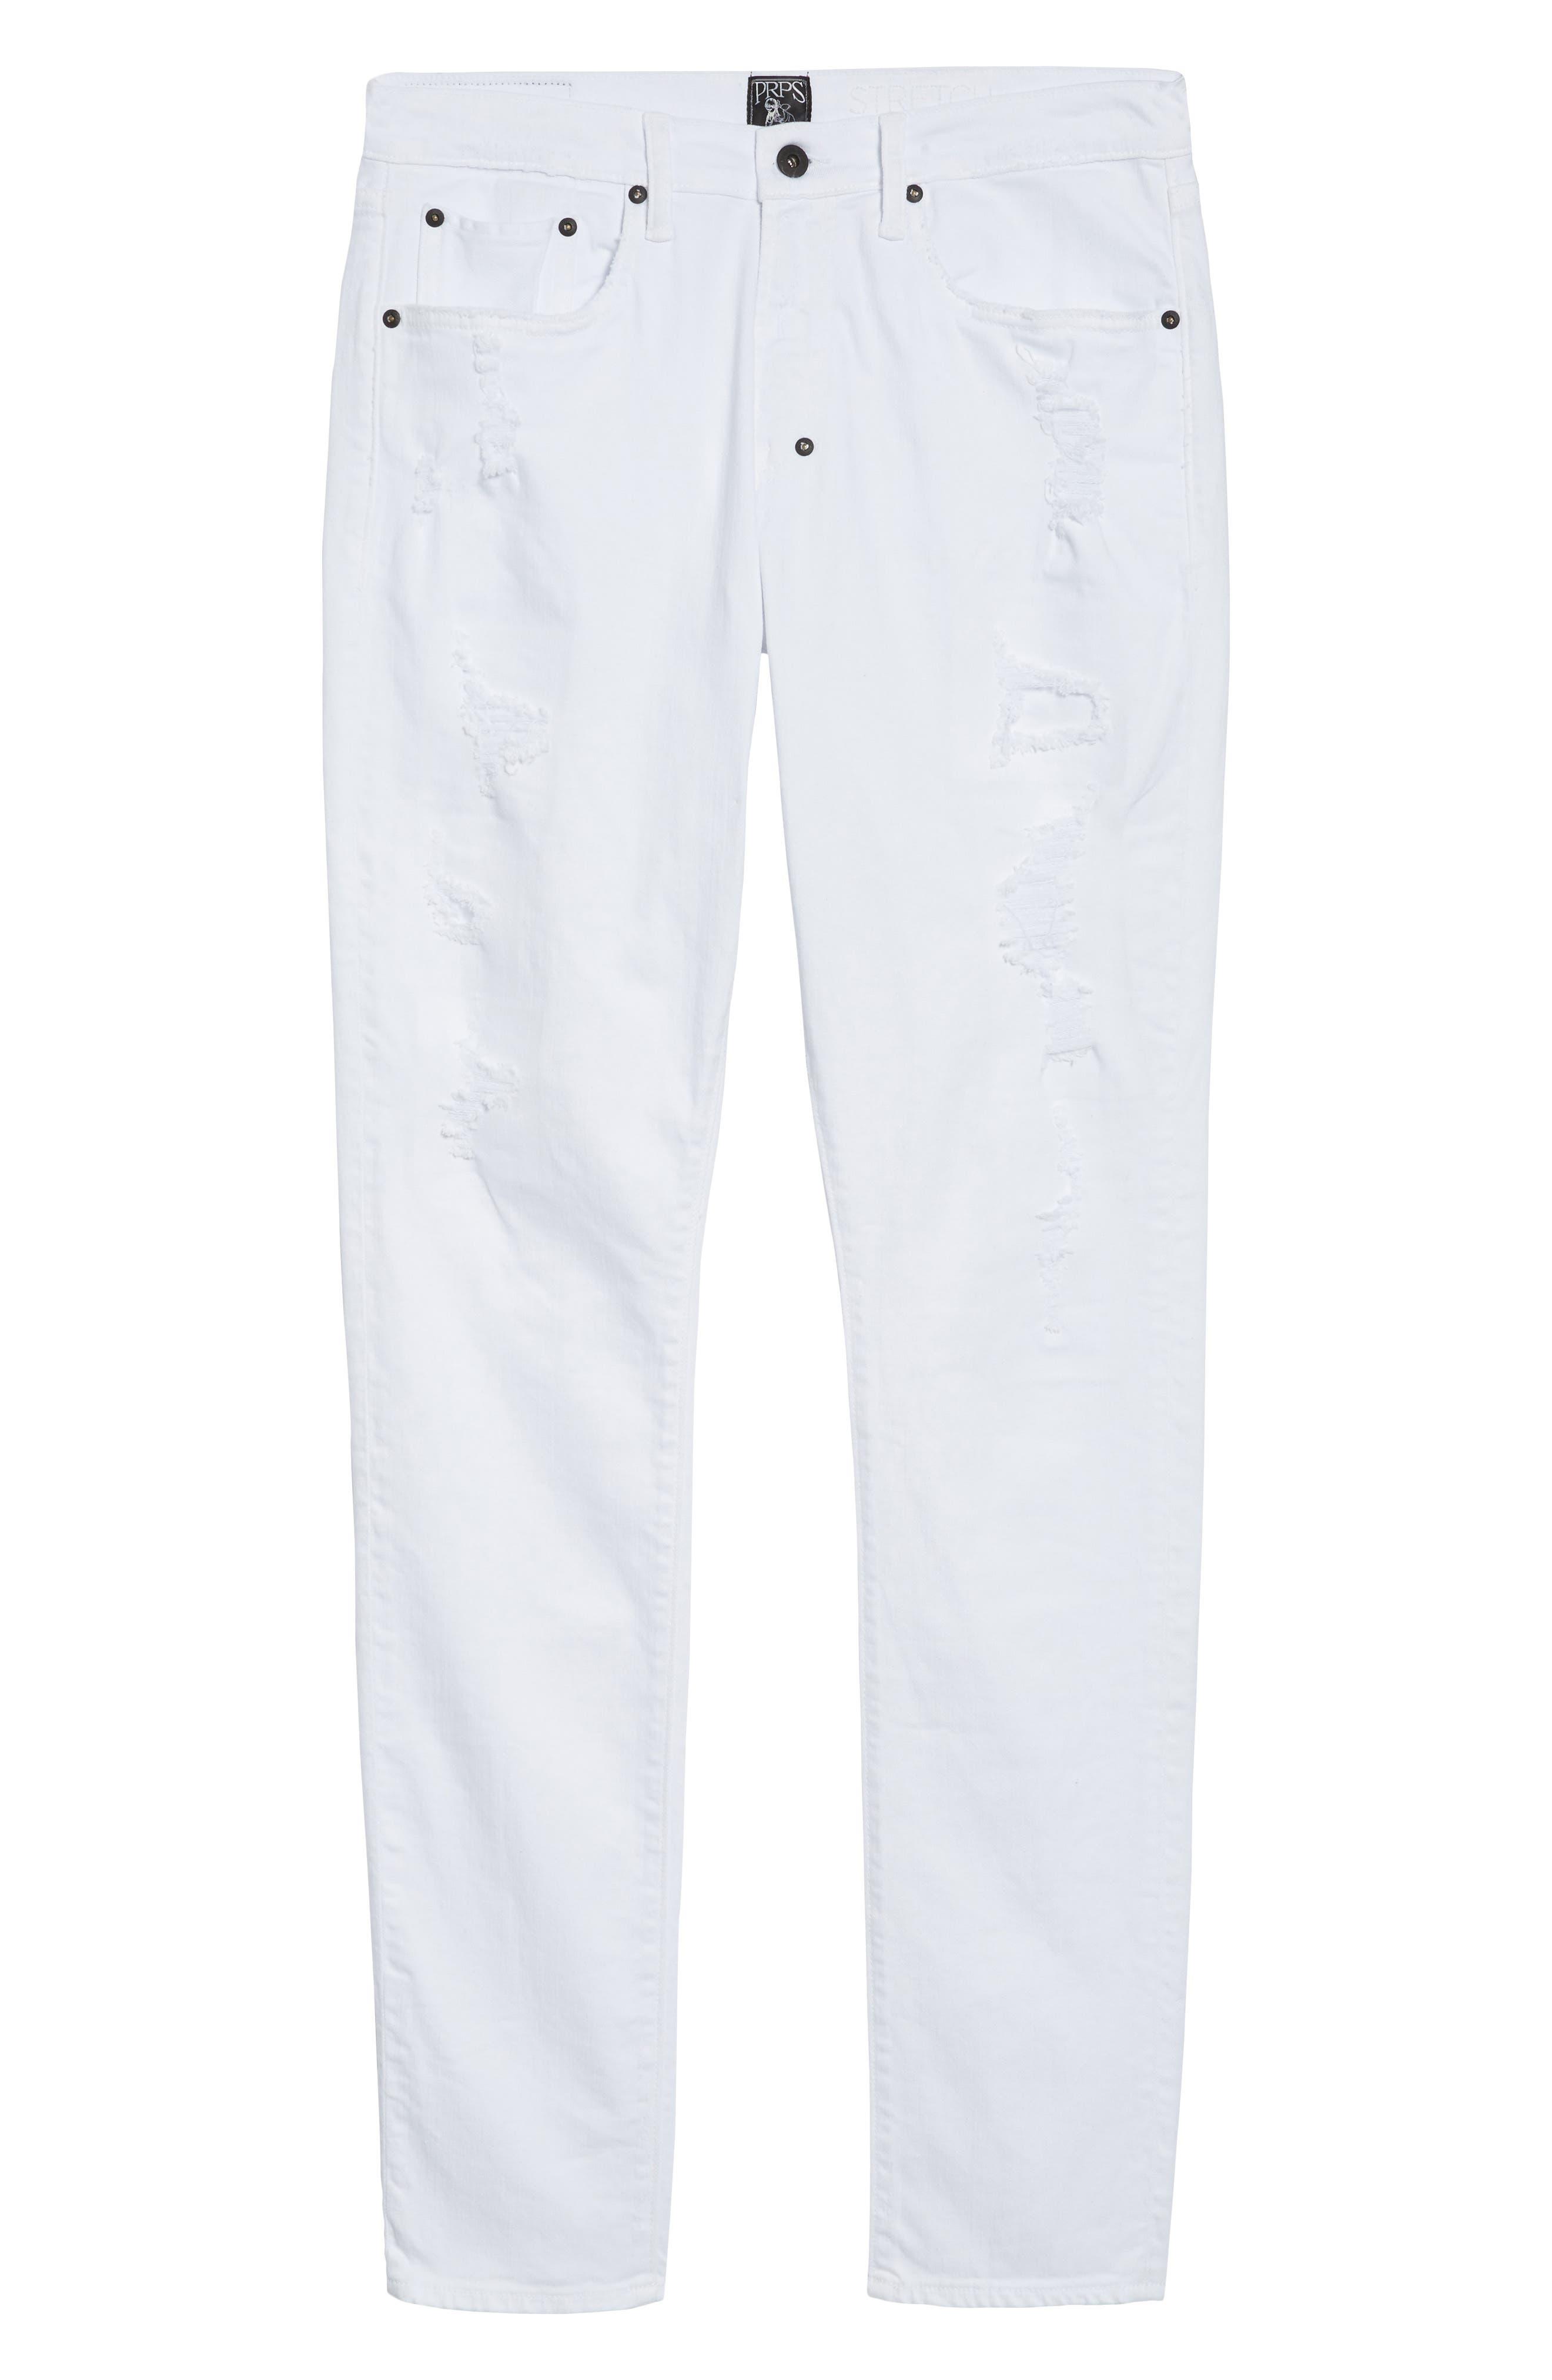 Windsor Slim Fit Jeans,                             Alternate thumbnail 6, color,                             100